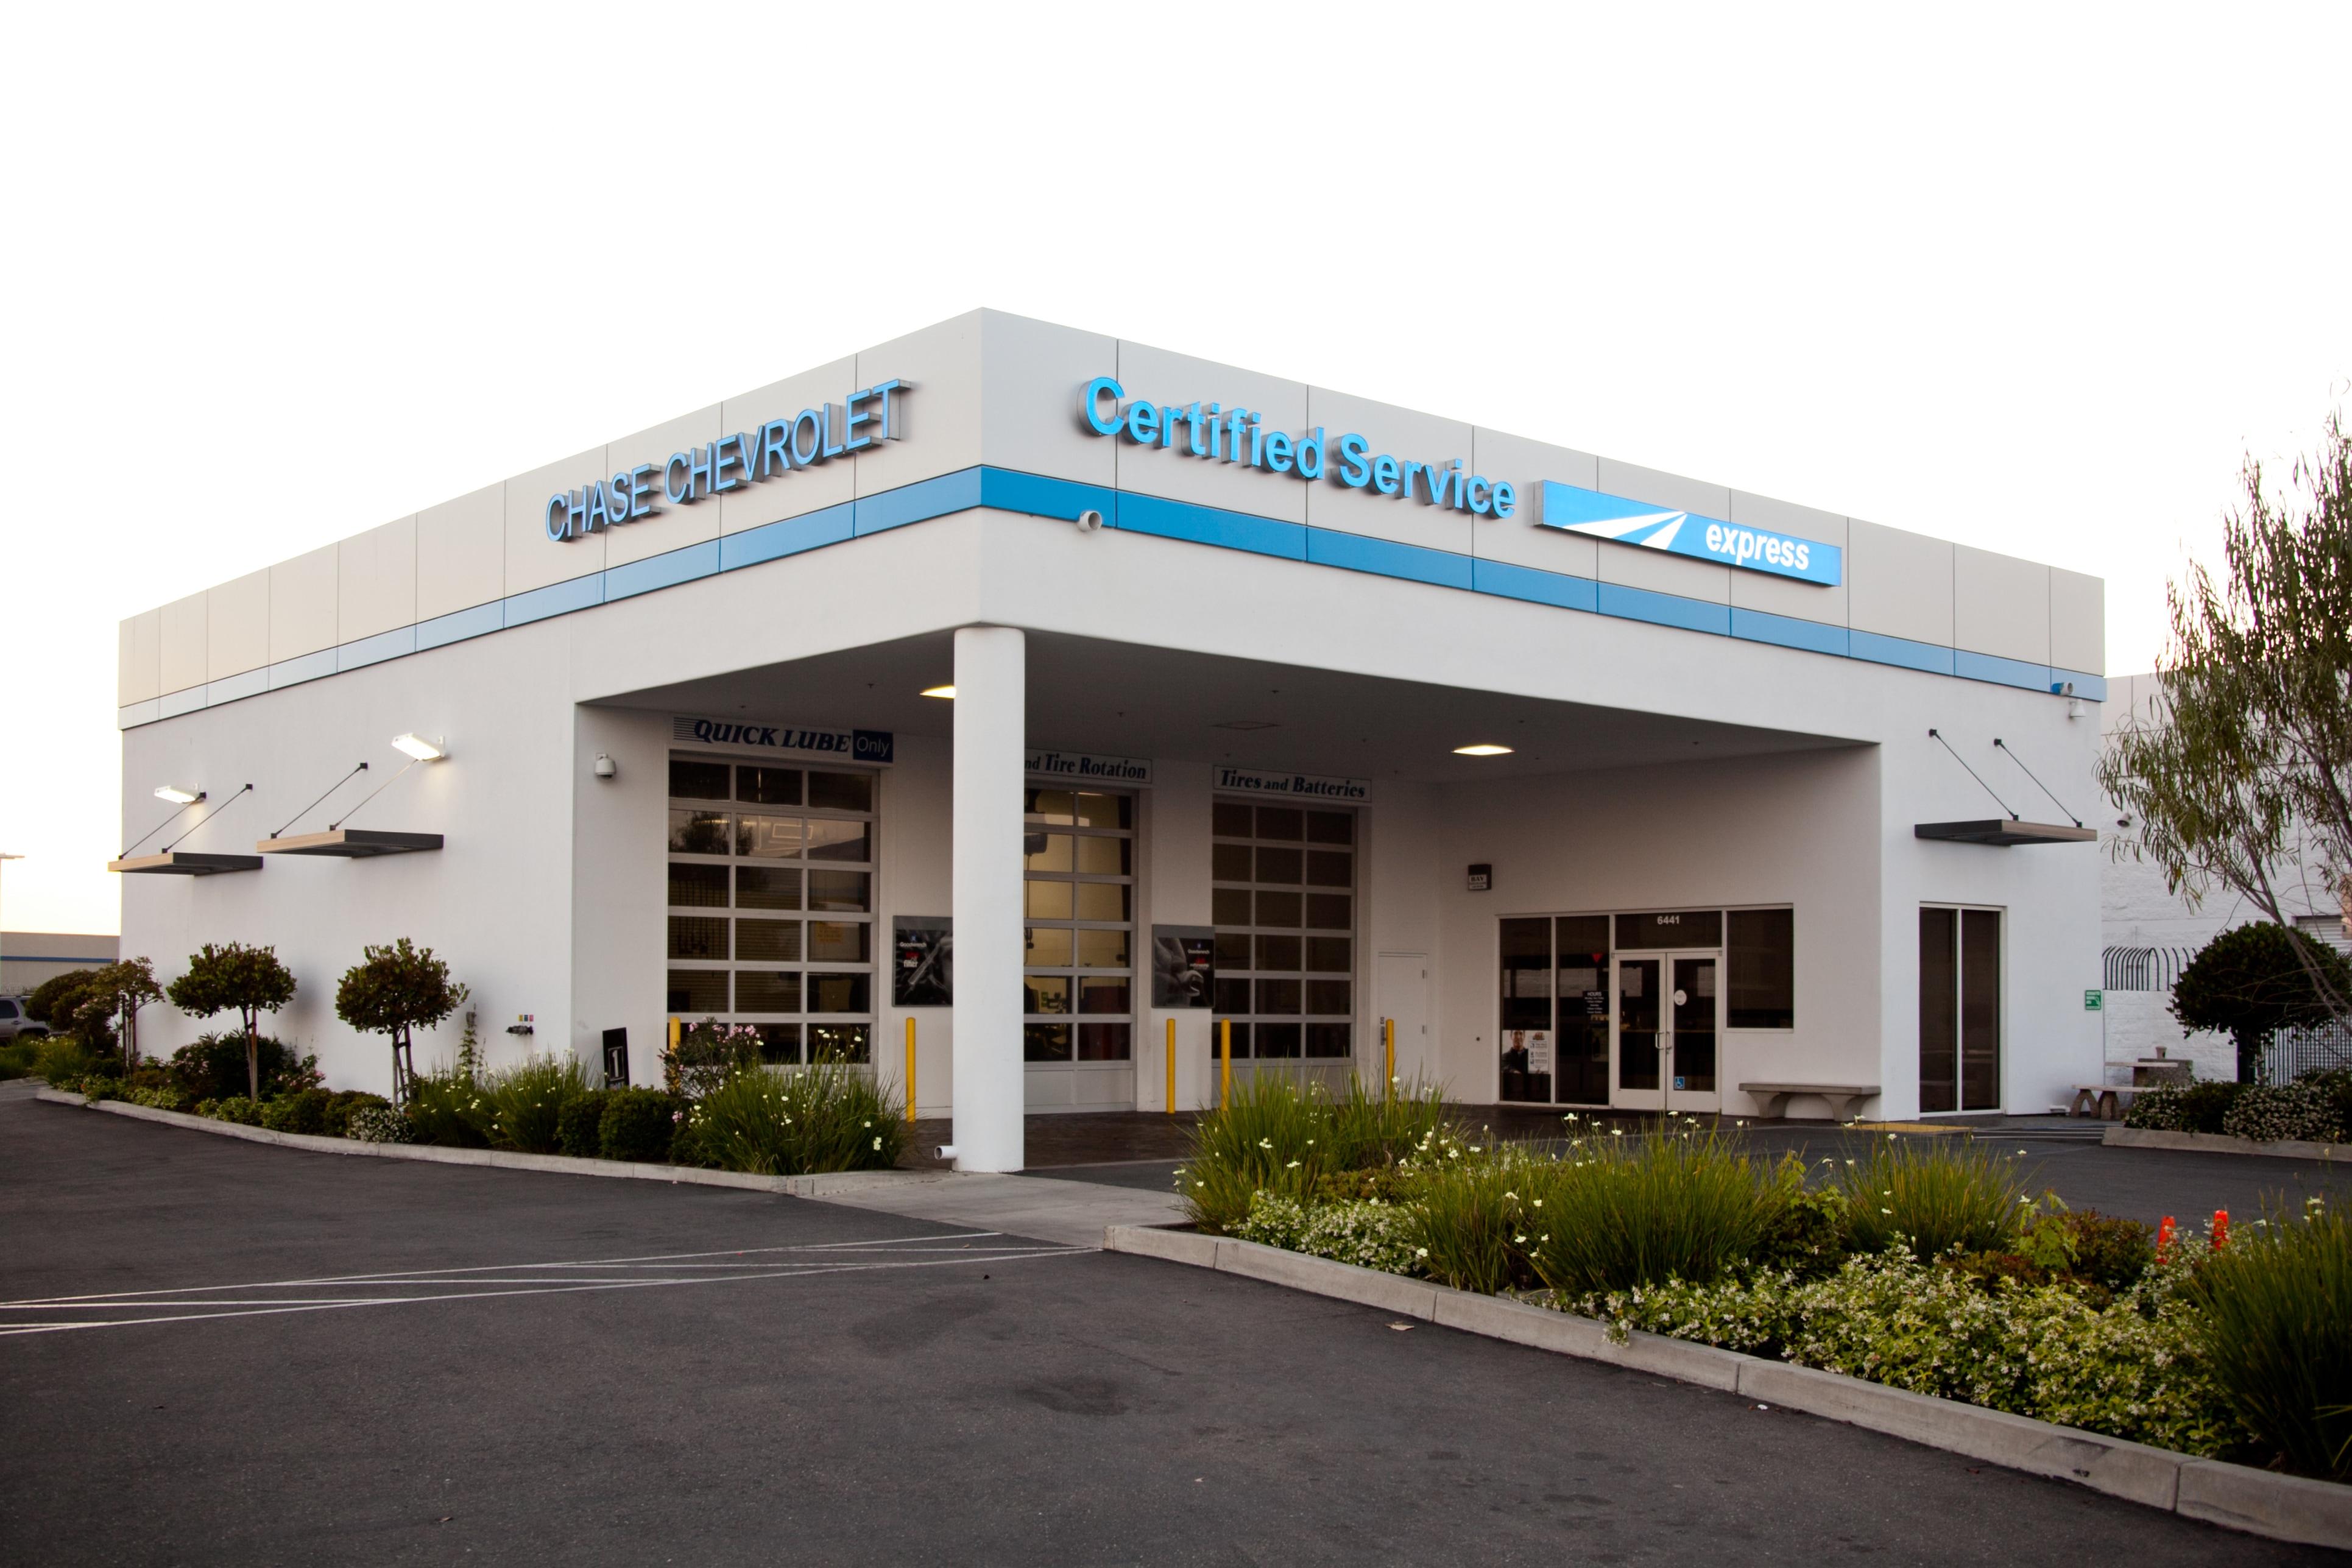 Chevy Service Car Repair In Stockton CA Chase Chevrolet Auto - Chevrolet dealer com